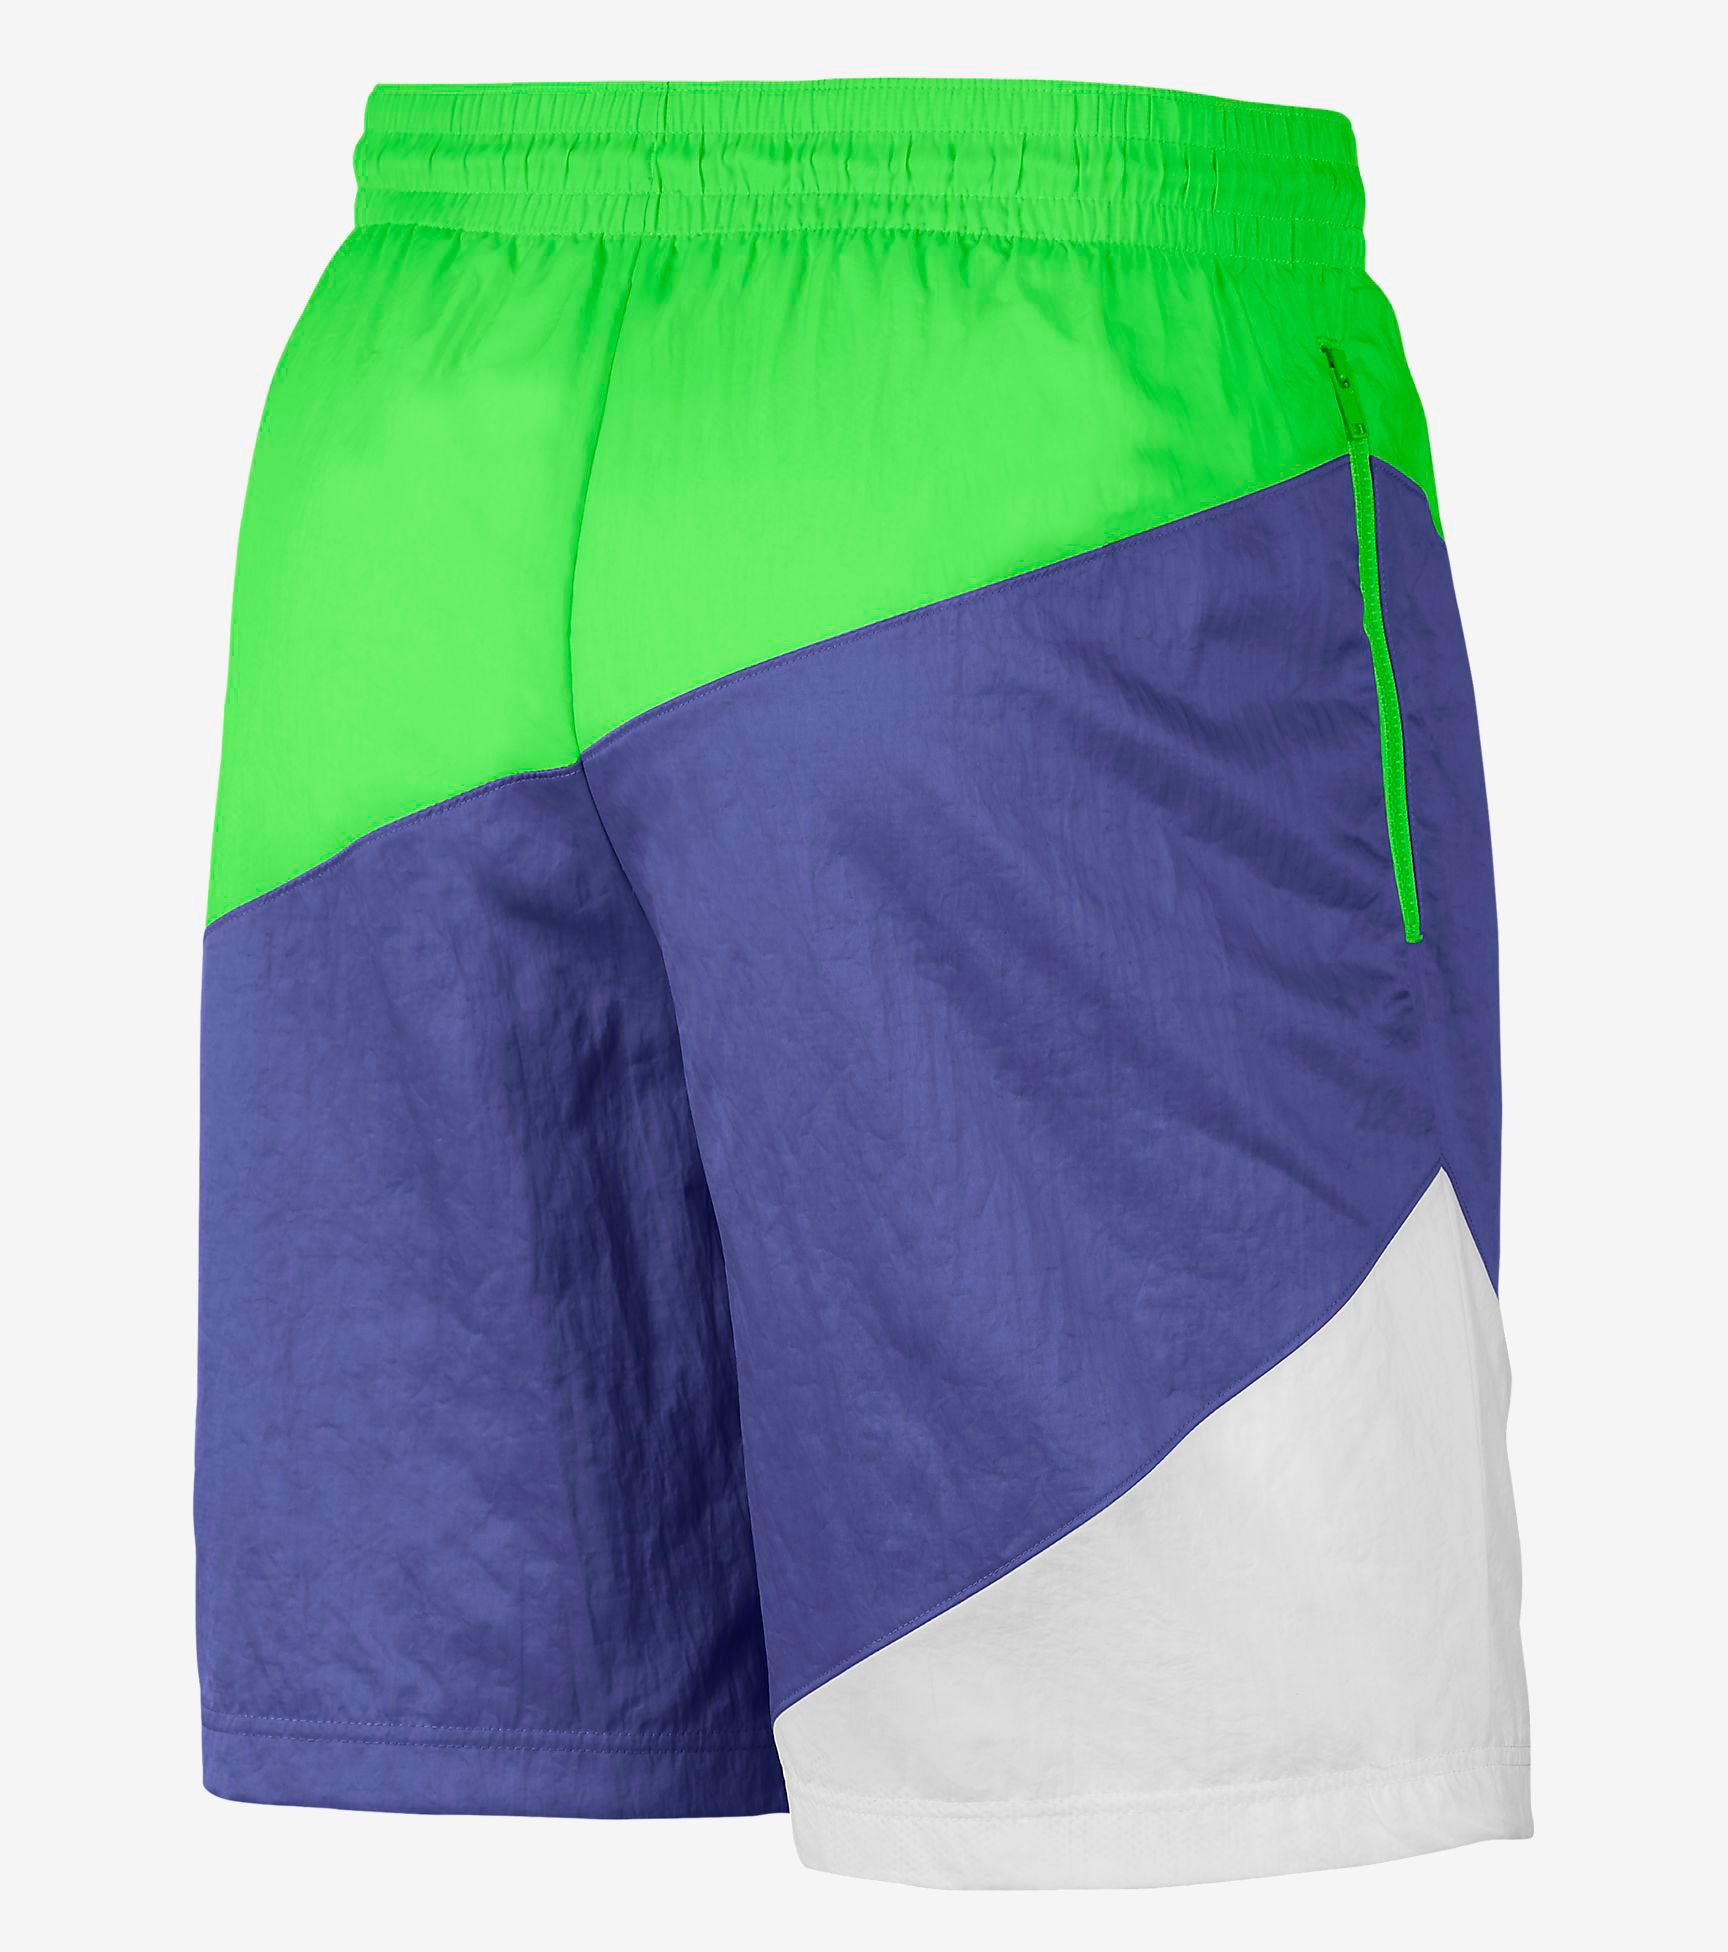 air-jordan-1-mid-hulk-shorts-3